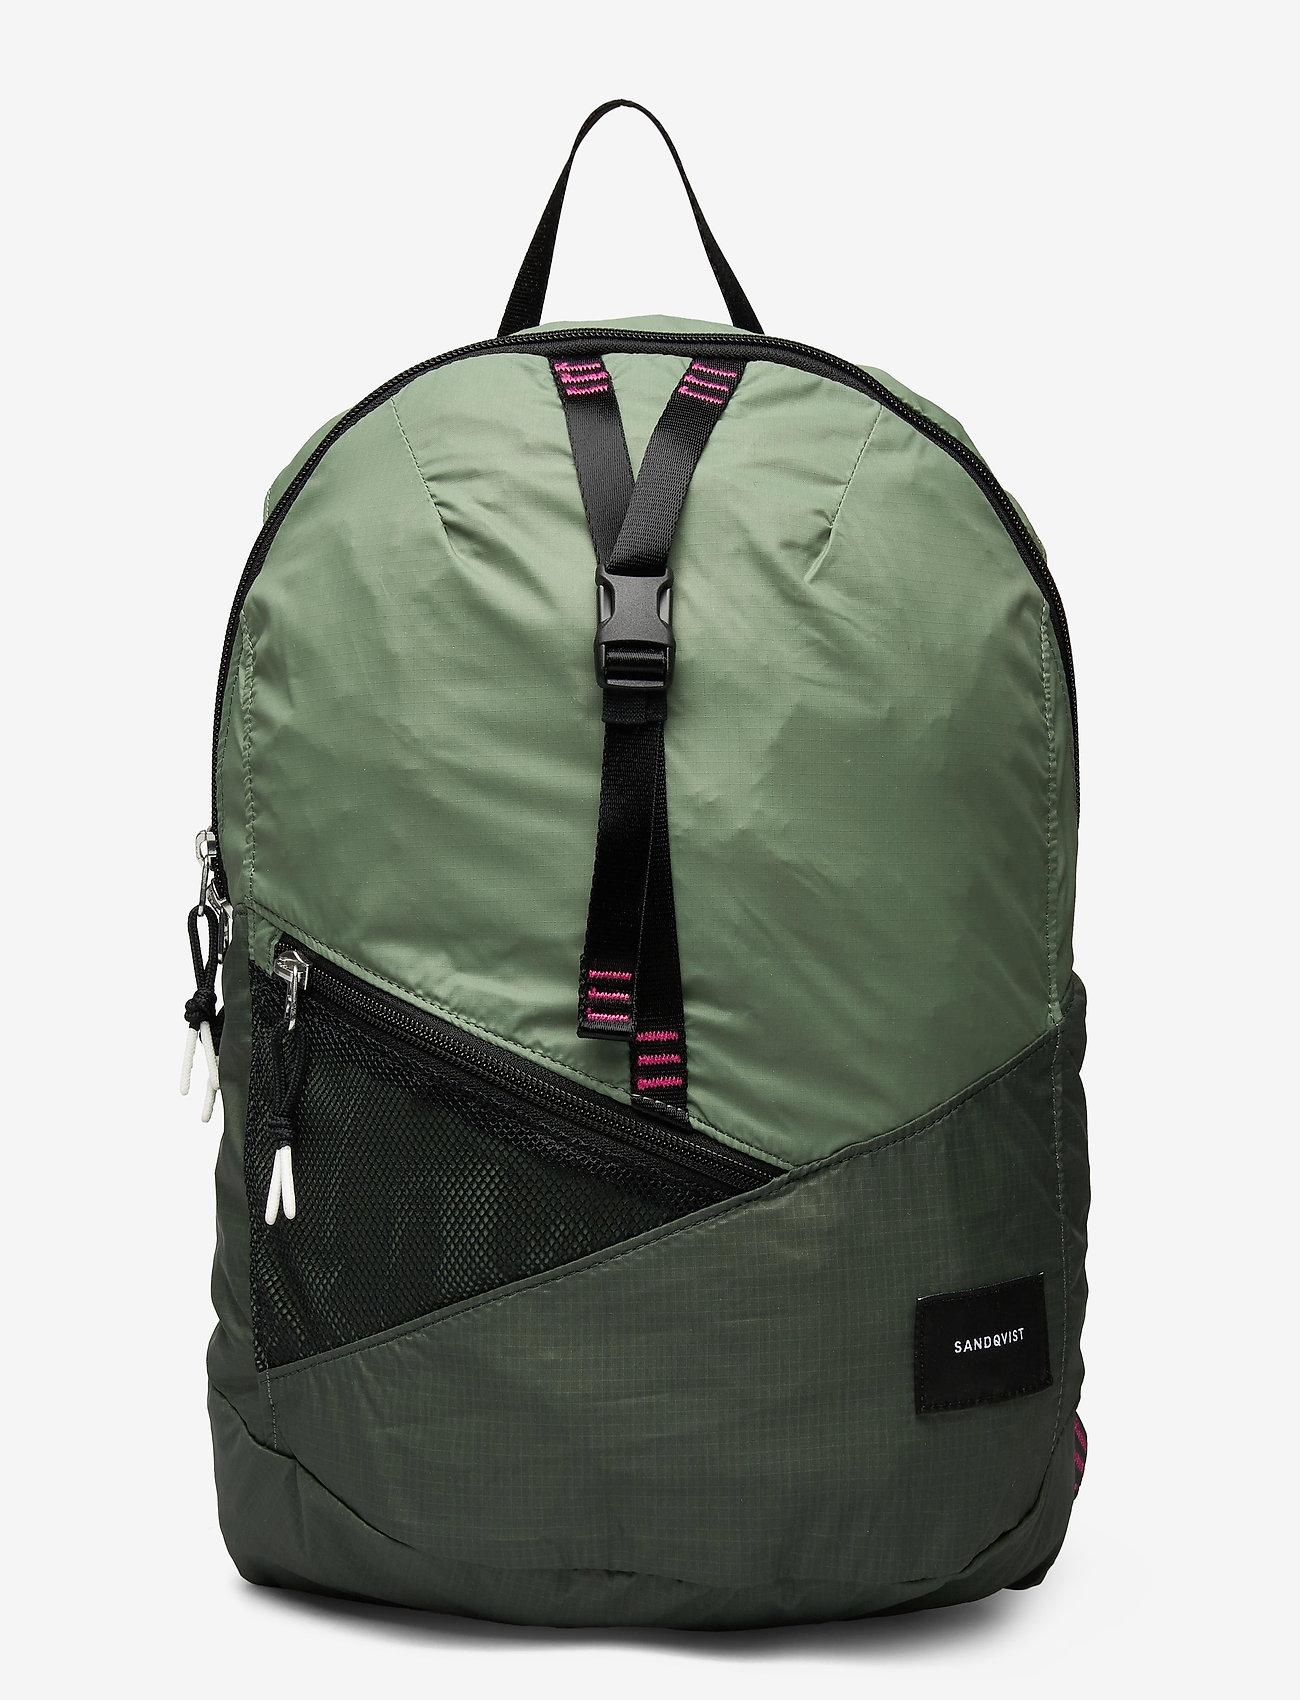 SANDQVIST - ERLAND LIGHTWEIGHT - bags - multi dusty green/night green - 0